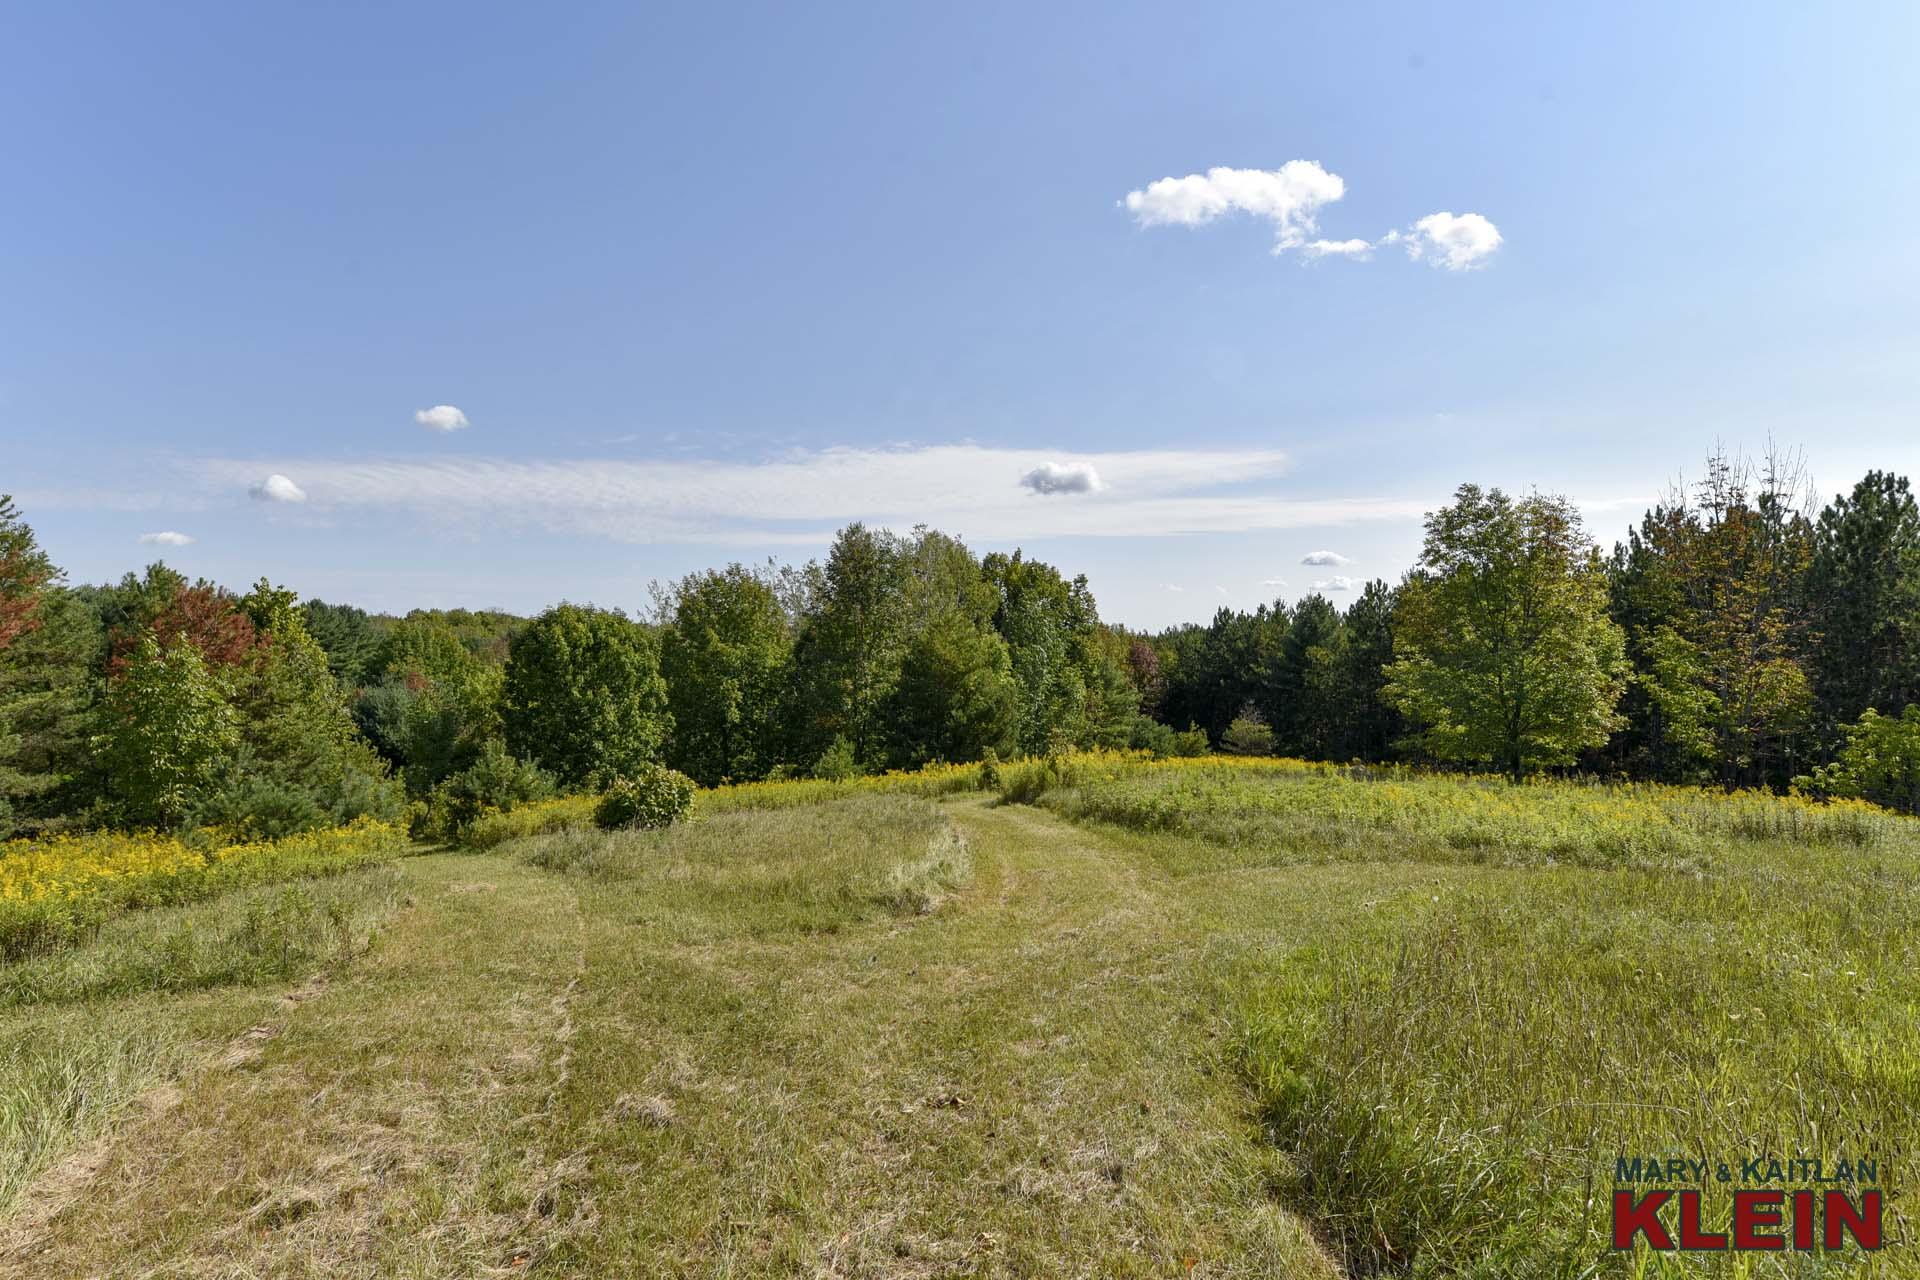 Trails, open area